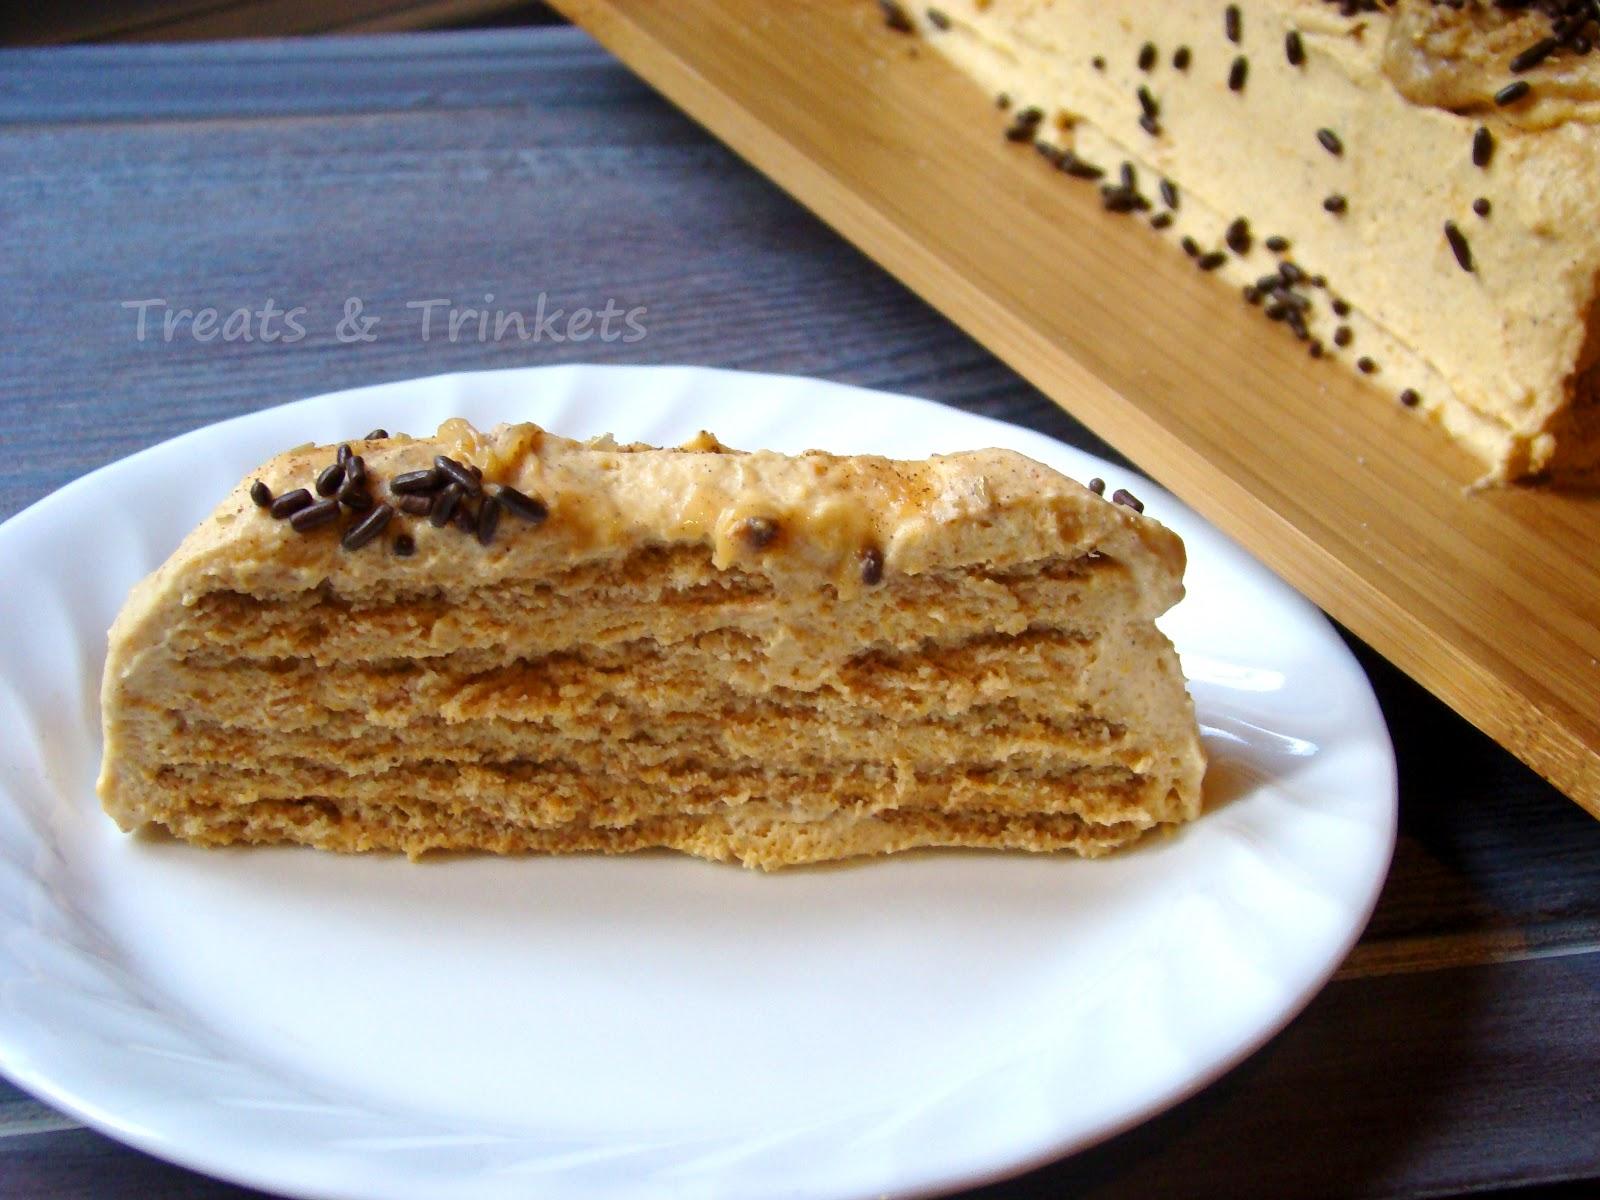 Treats & Trinkets: Pumpkin Pie Icebox Cake